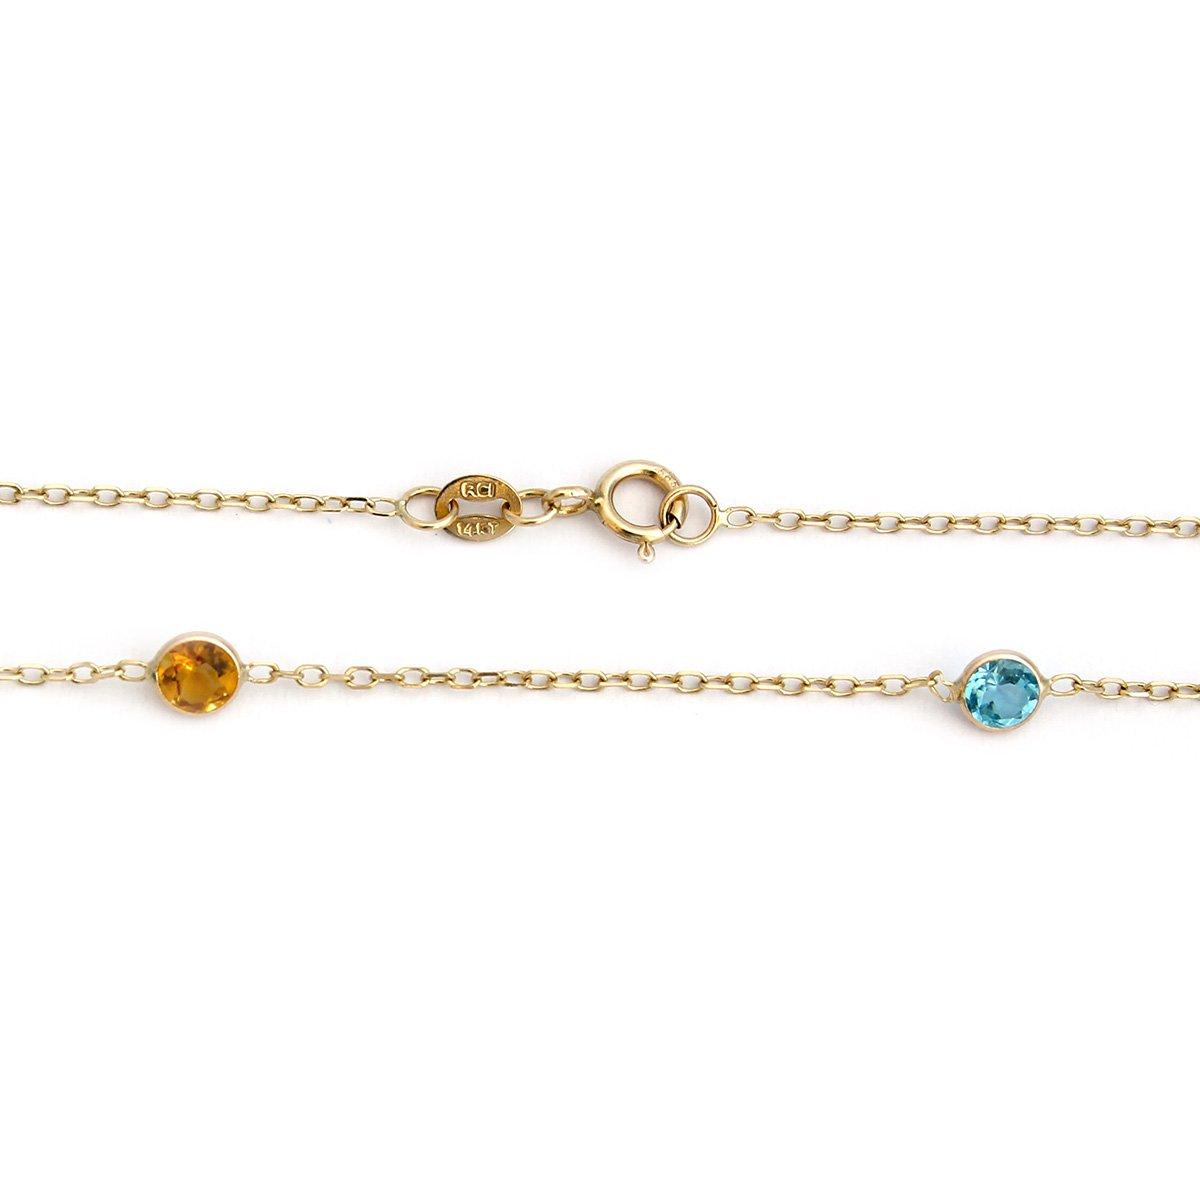 14k Yellow Gold Bezel Set Natural Gemstones Station Necklace, 16'' by Beauniq (Image #2)